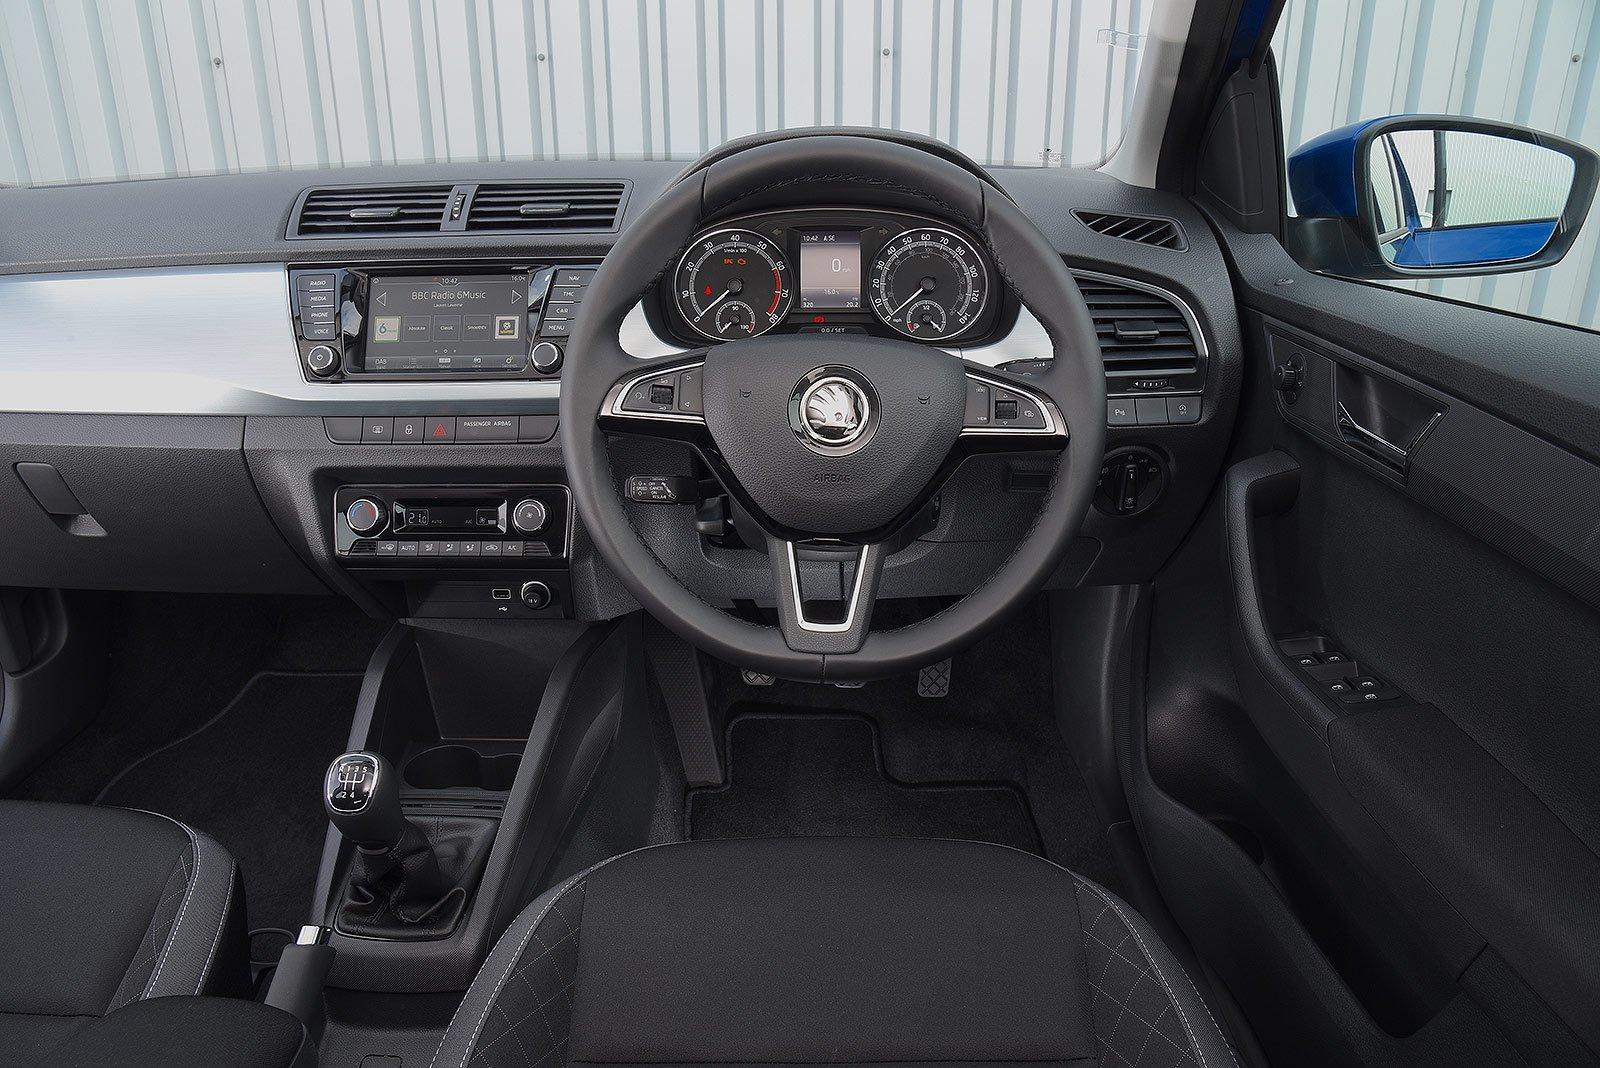 Skoda Fabia S 1.0 MPI 60PS - interior